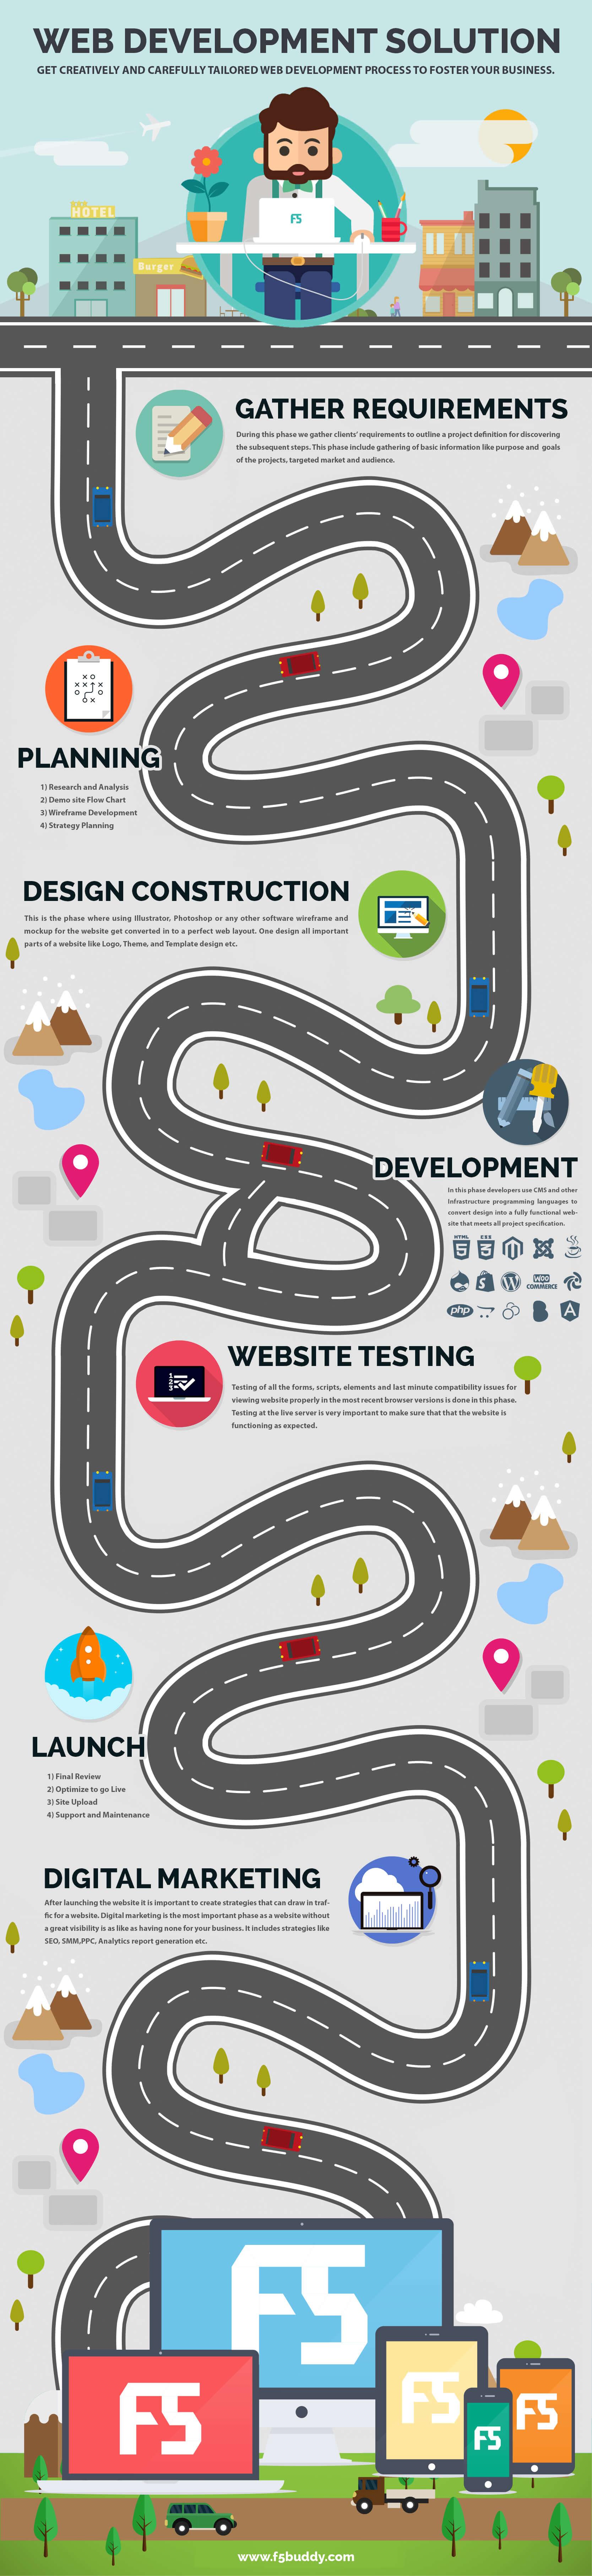 Web-development-solution-infographic